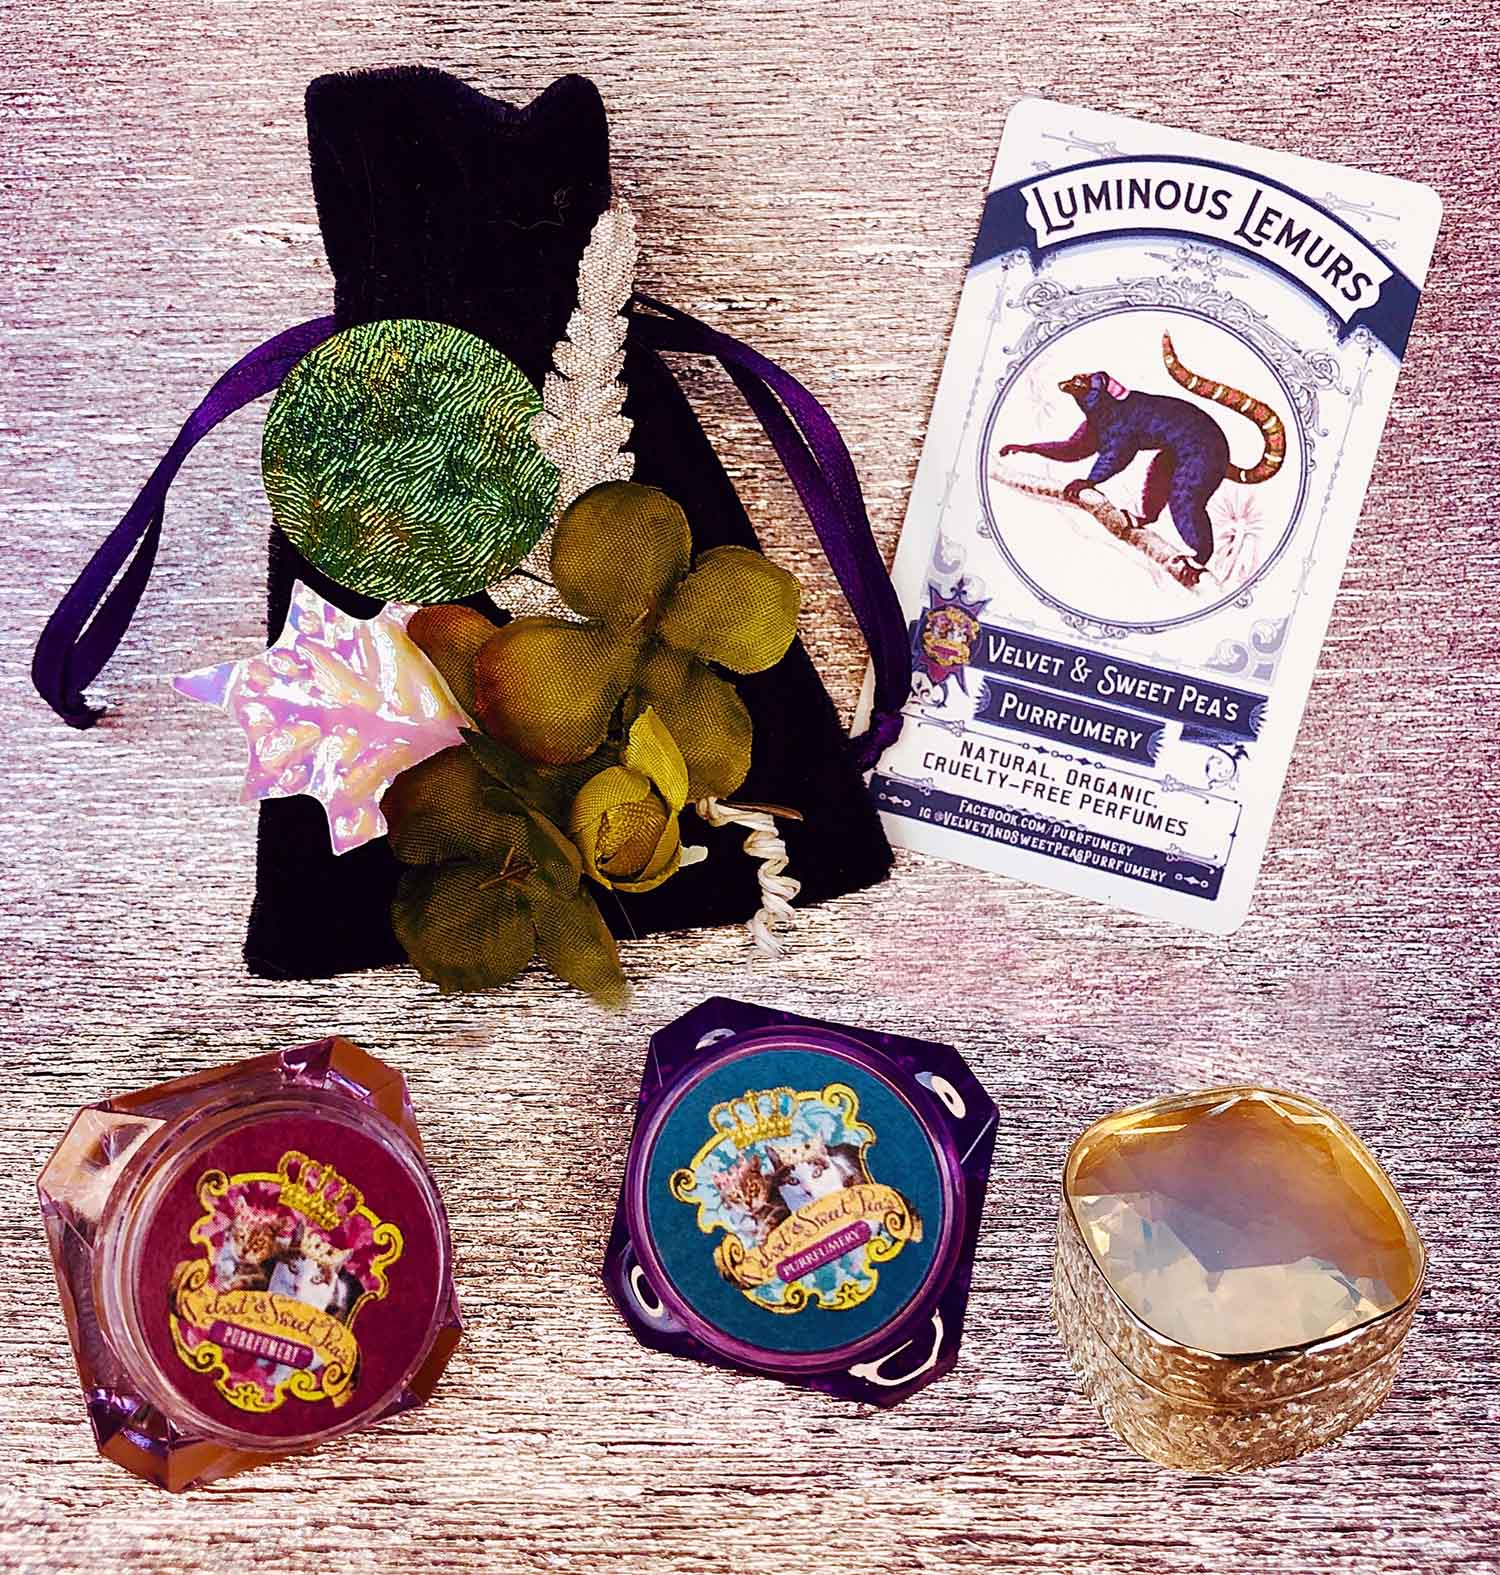 Velvet and Sweet Pea's Purrfumery's Luscious Lemur Solid Perfume.